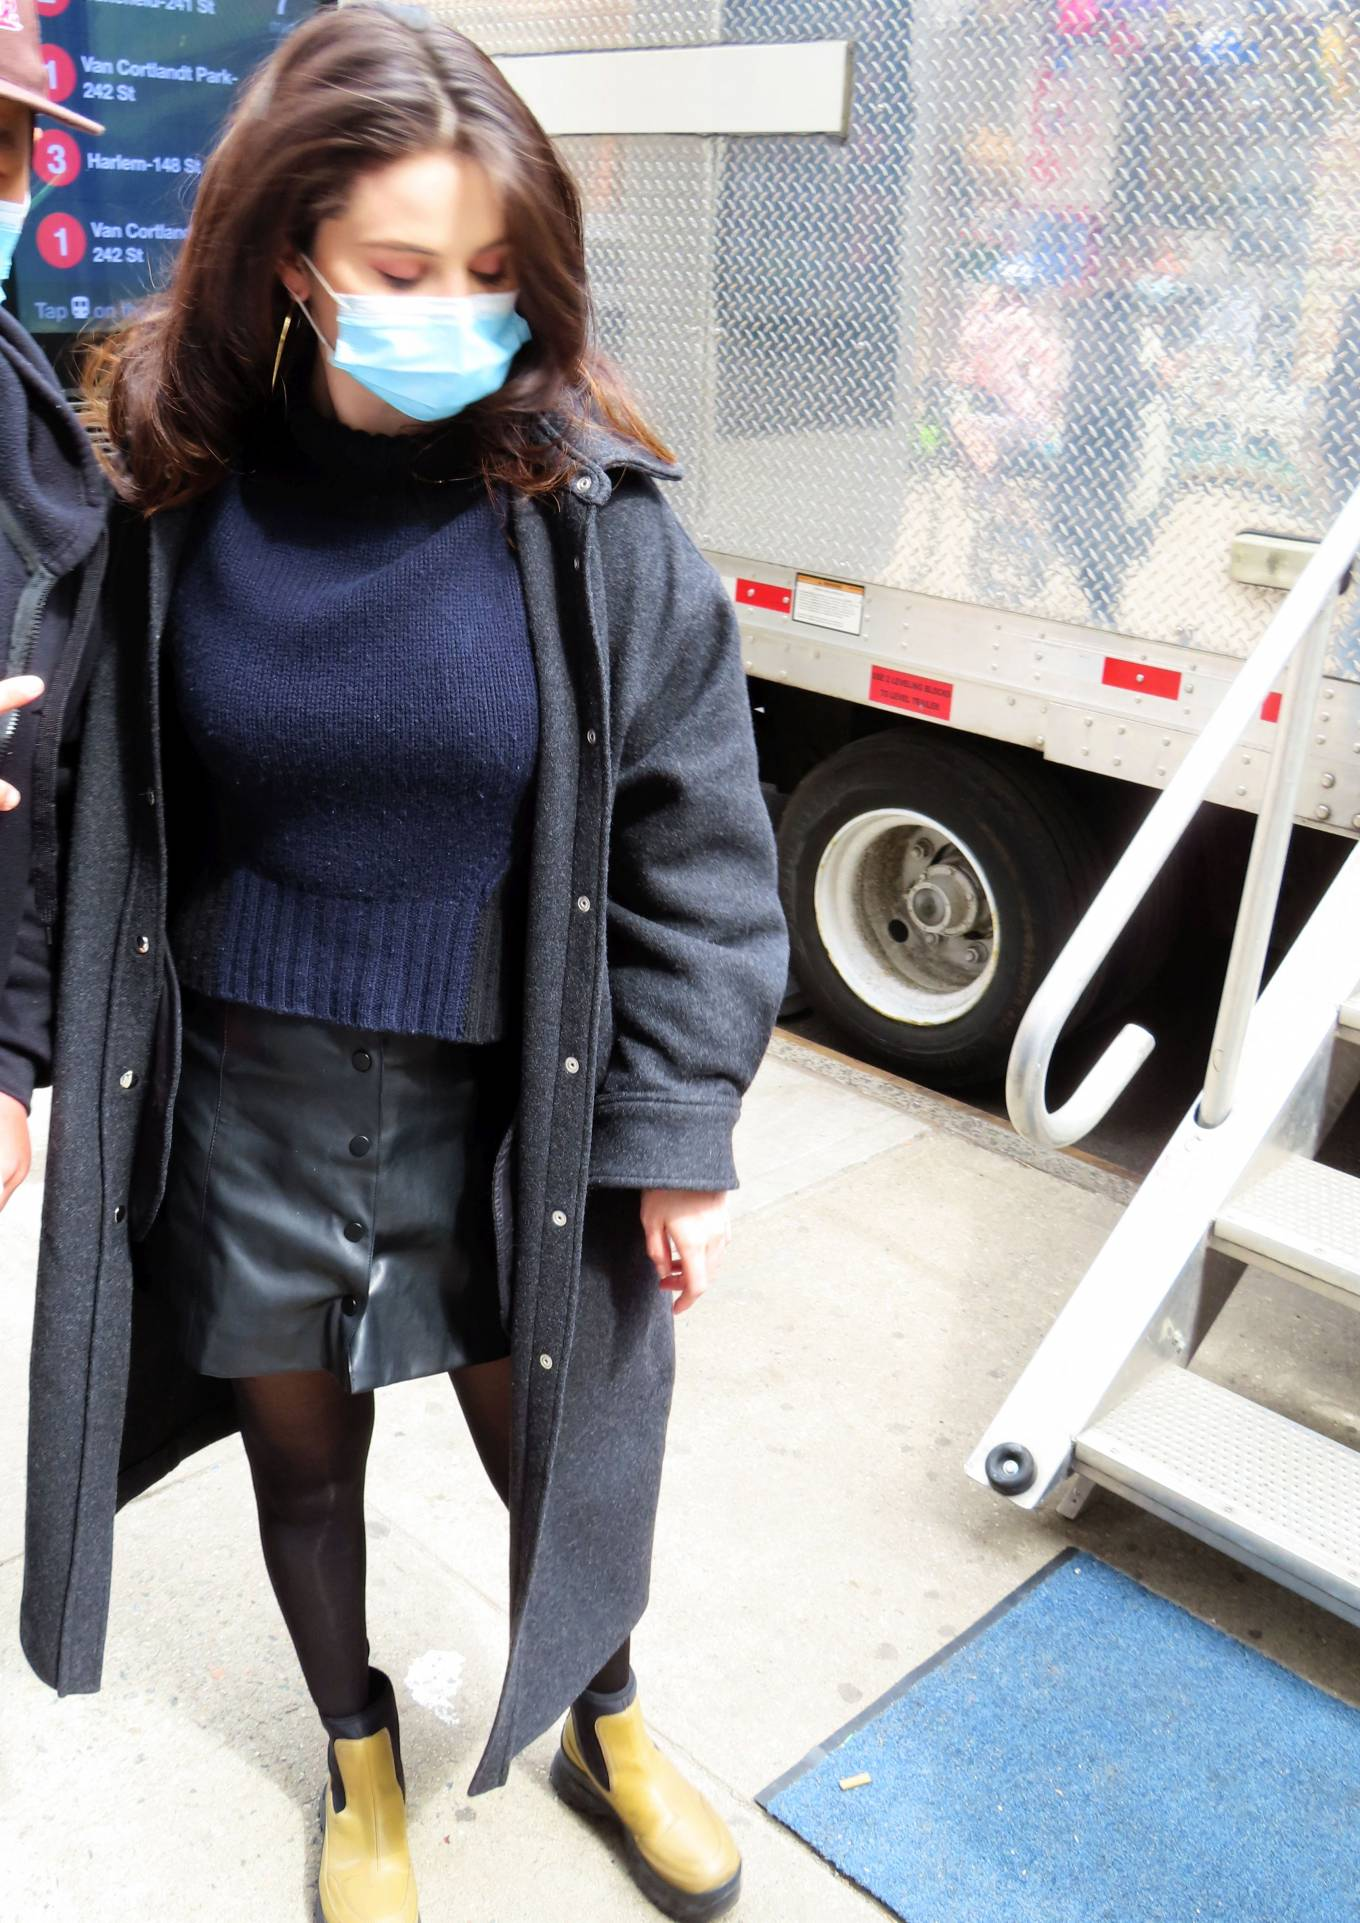 Selena Gomez, black mini skirt, leather, beige Stella McCartney boots, oversized black IRO jacket, mini, fitted, front button, navy blue sweater, black leggings. Selena Gomez rocking a black fitted leather mini skirt